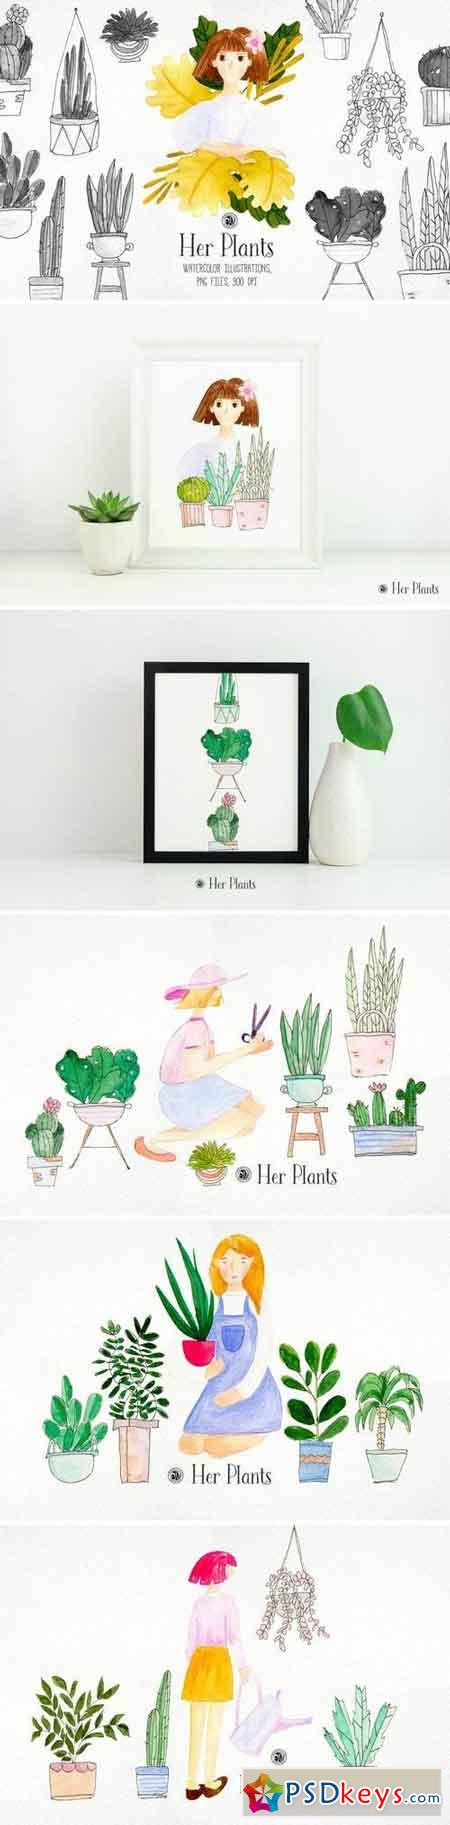 Her Plants 3332505